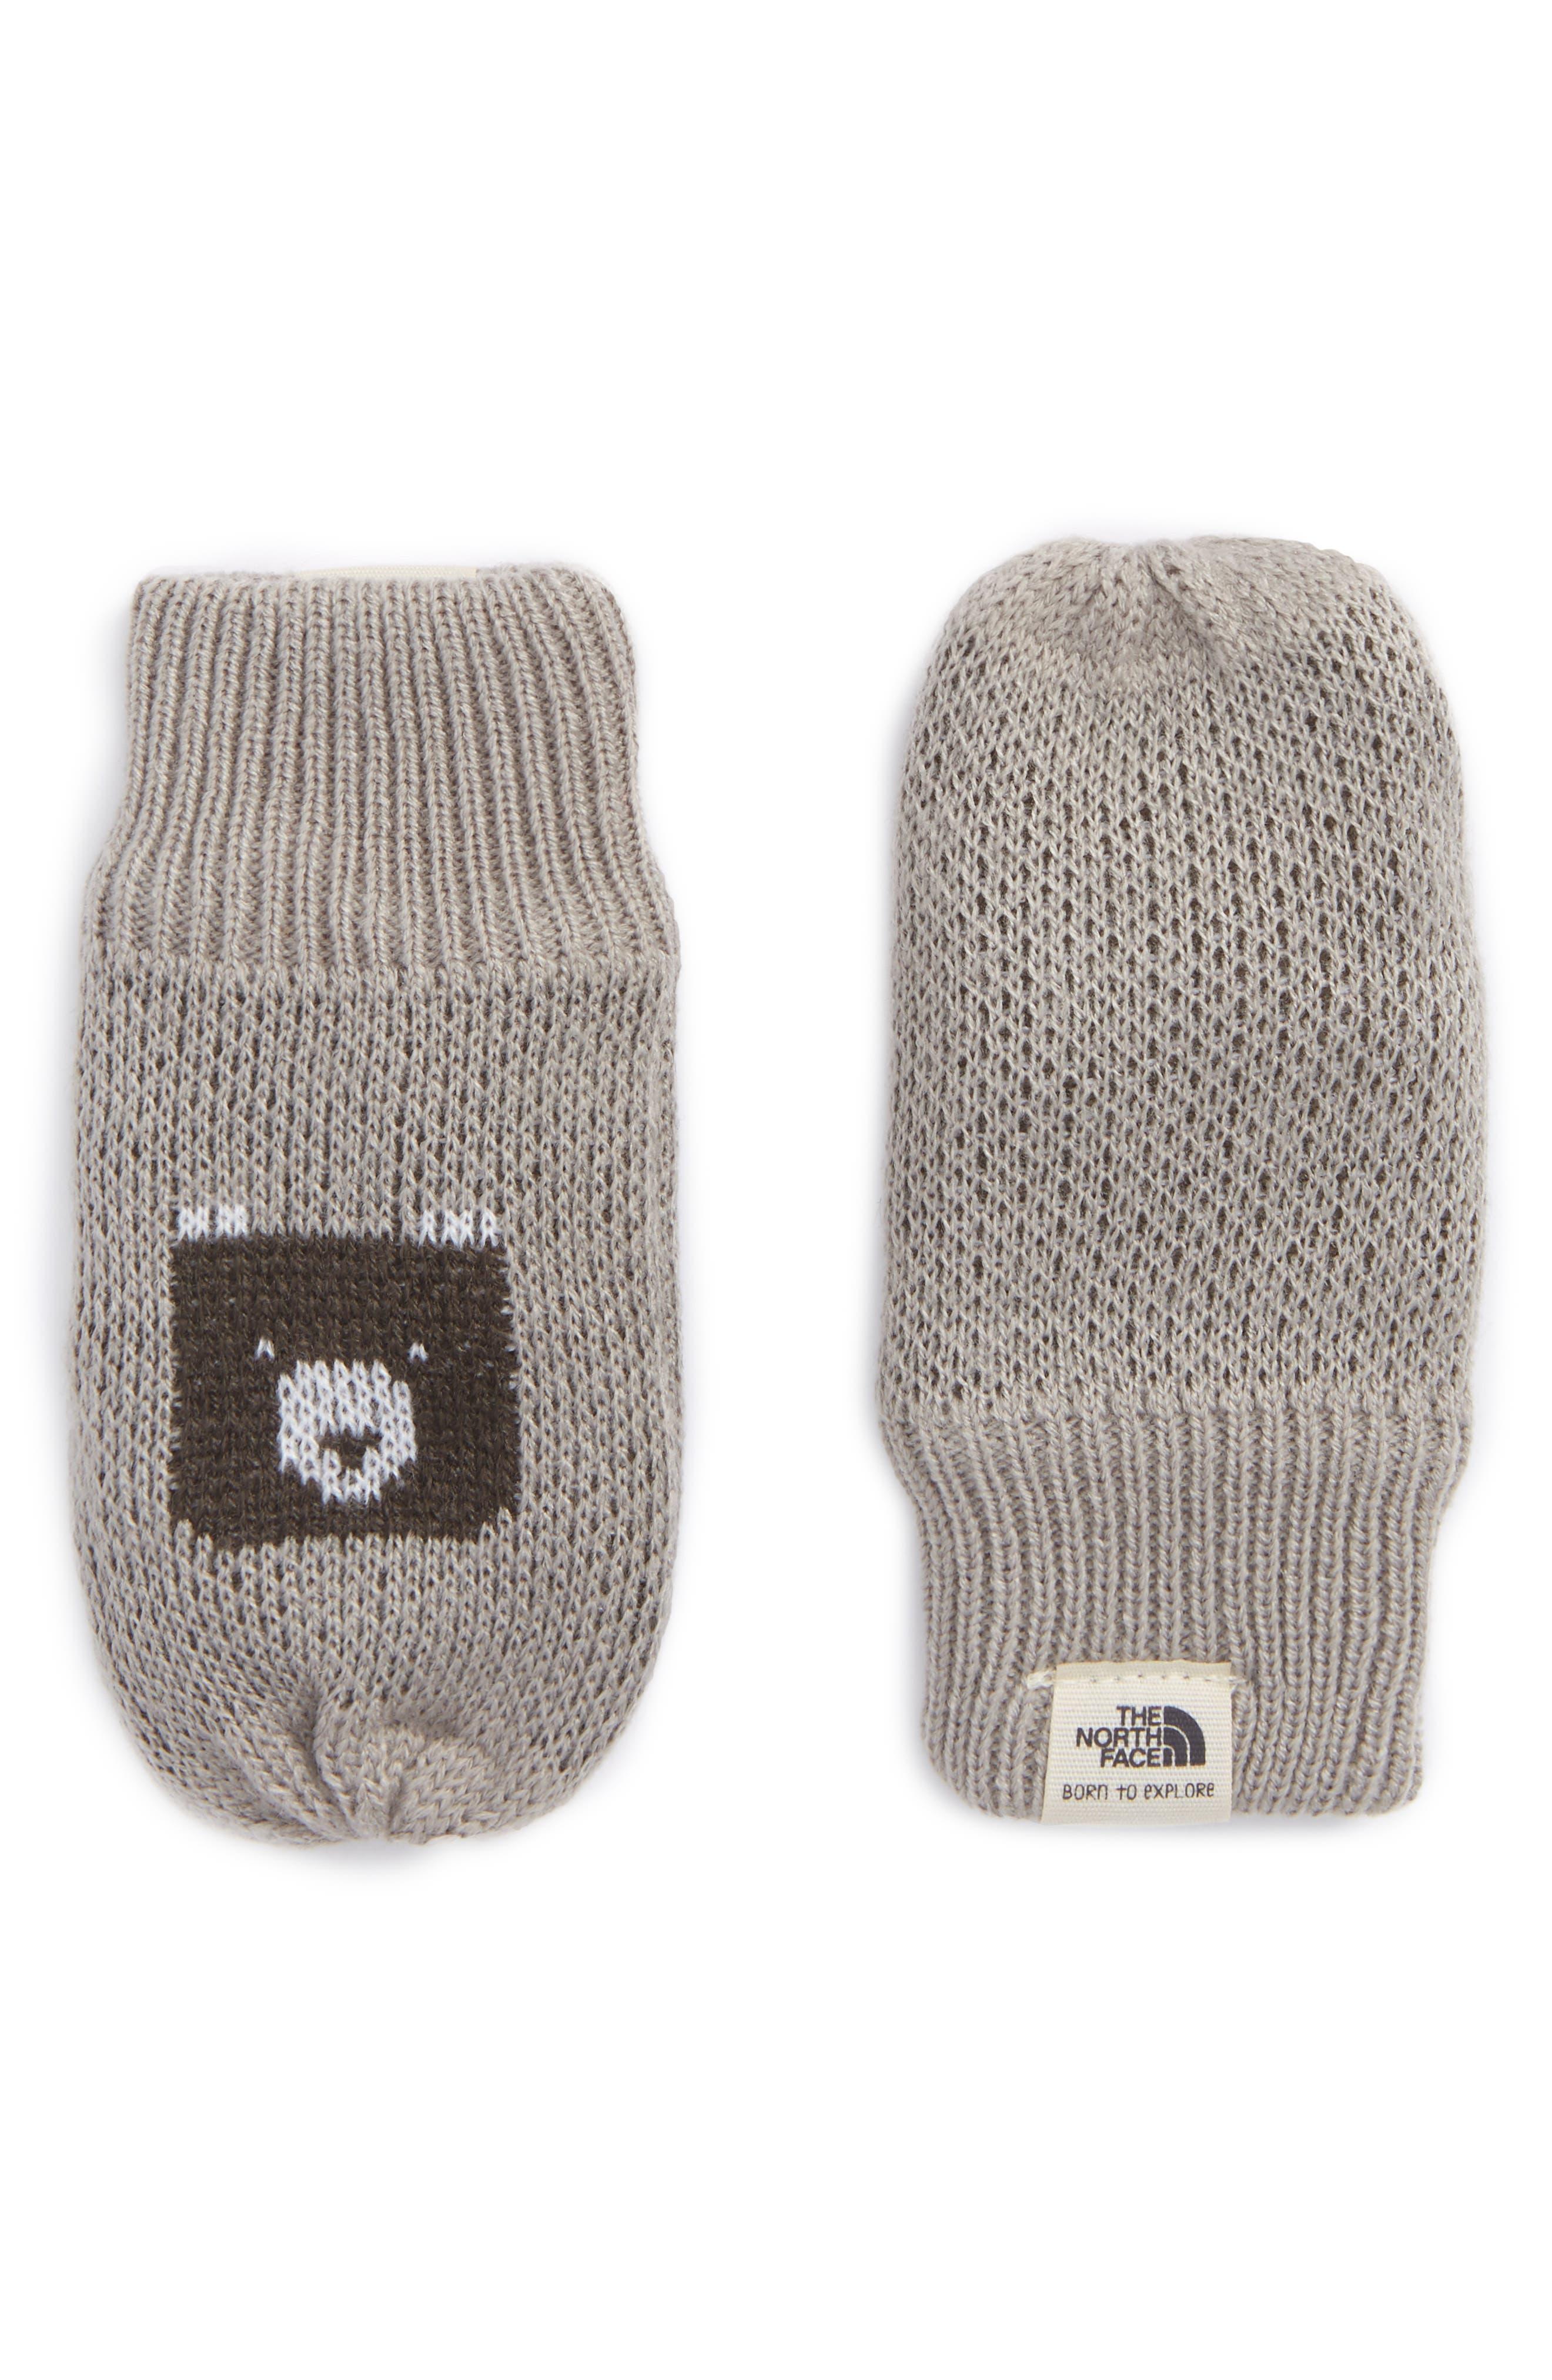 Faroe Knit Mittens,                         Main,                         color, 021